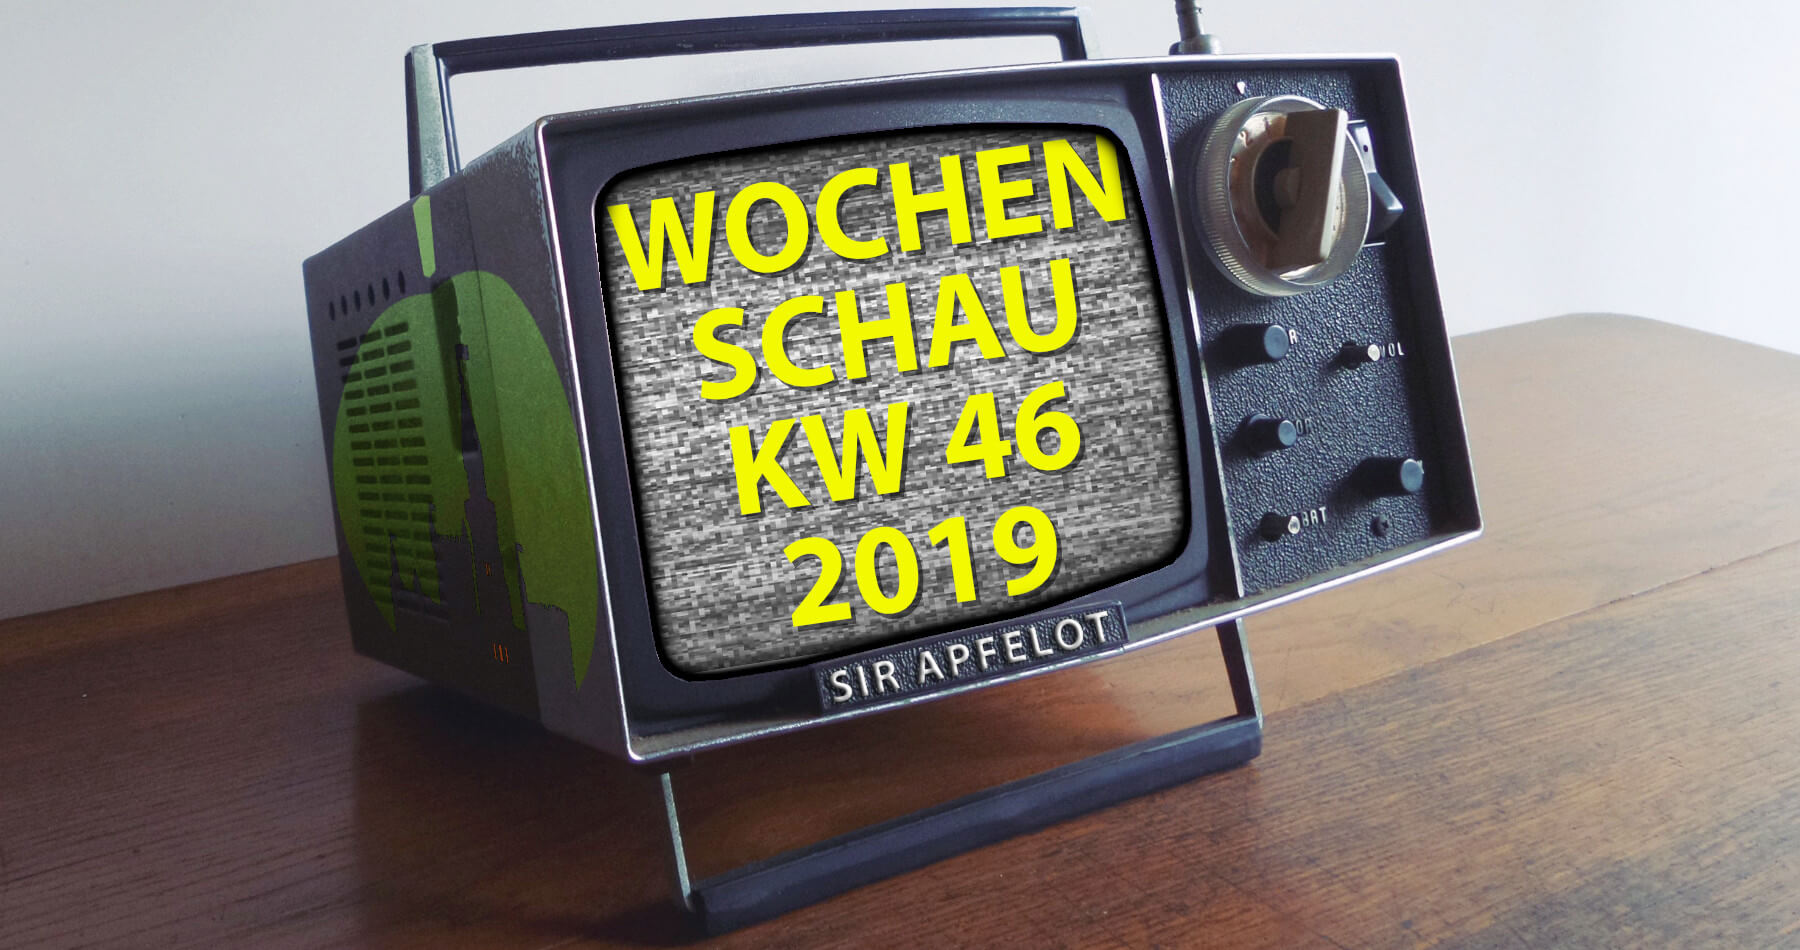 kw 46 2019